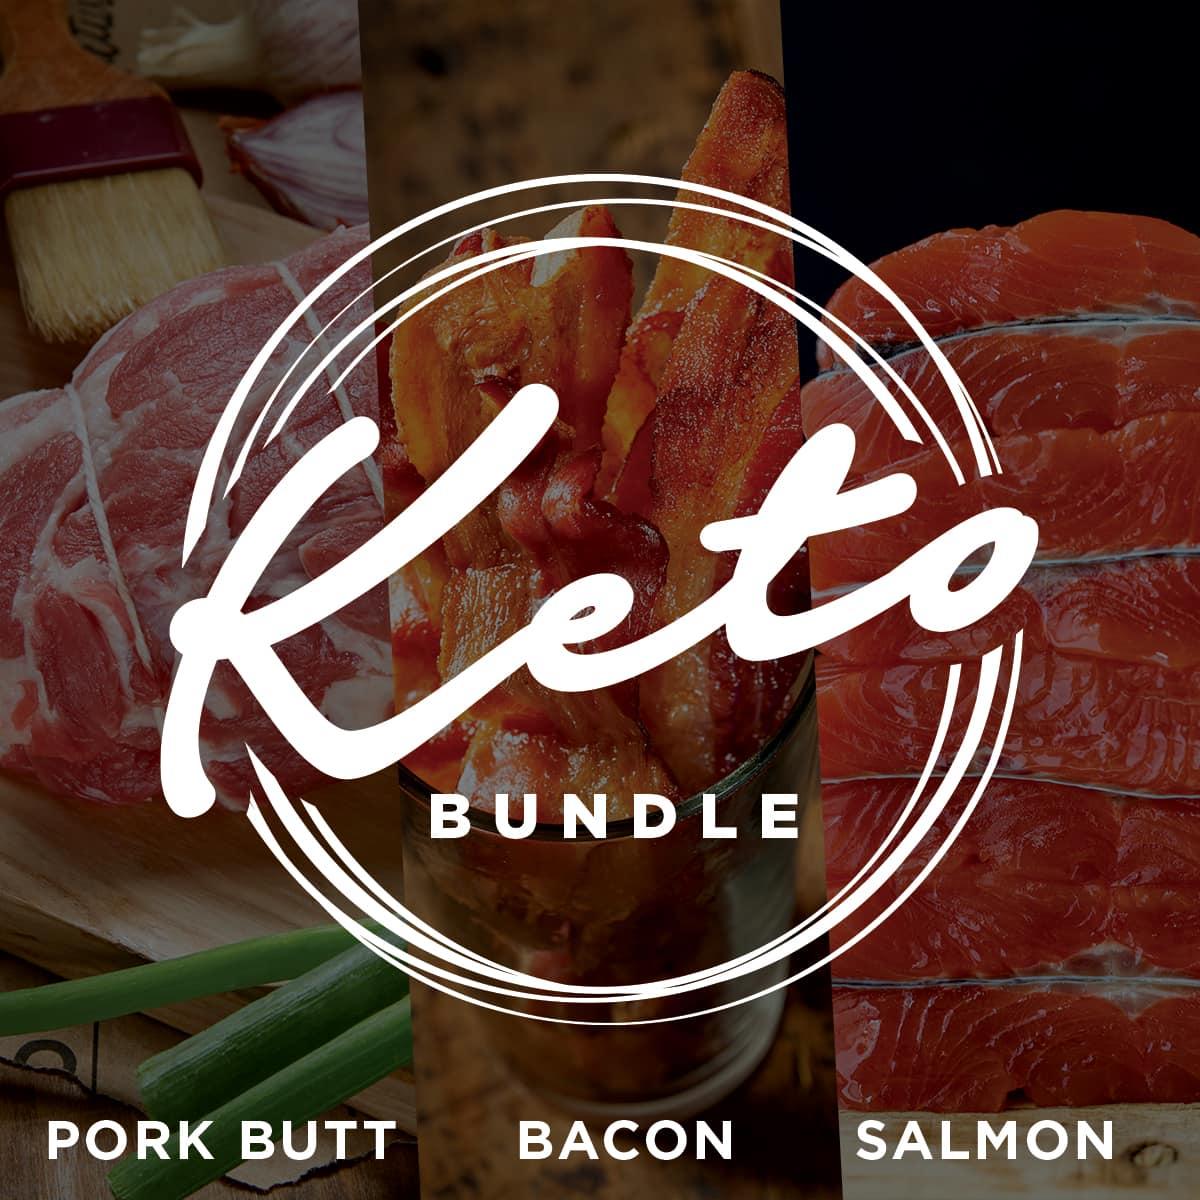 LAST CALL! ButcherBox – Free Ultimate Keto Bundle!